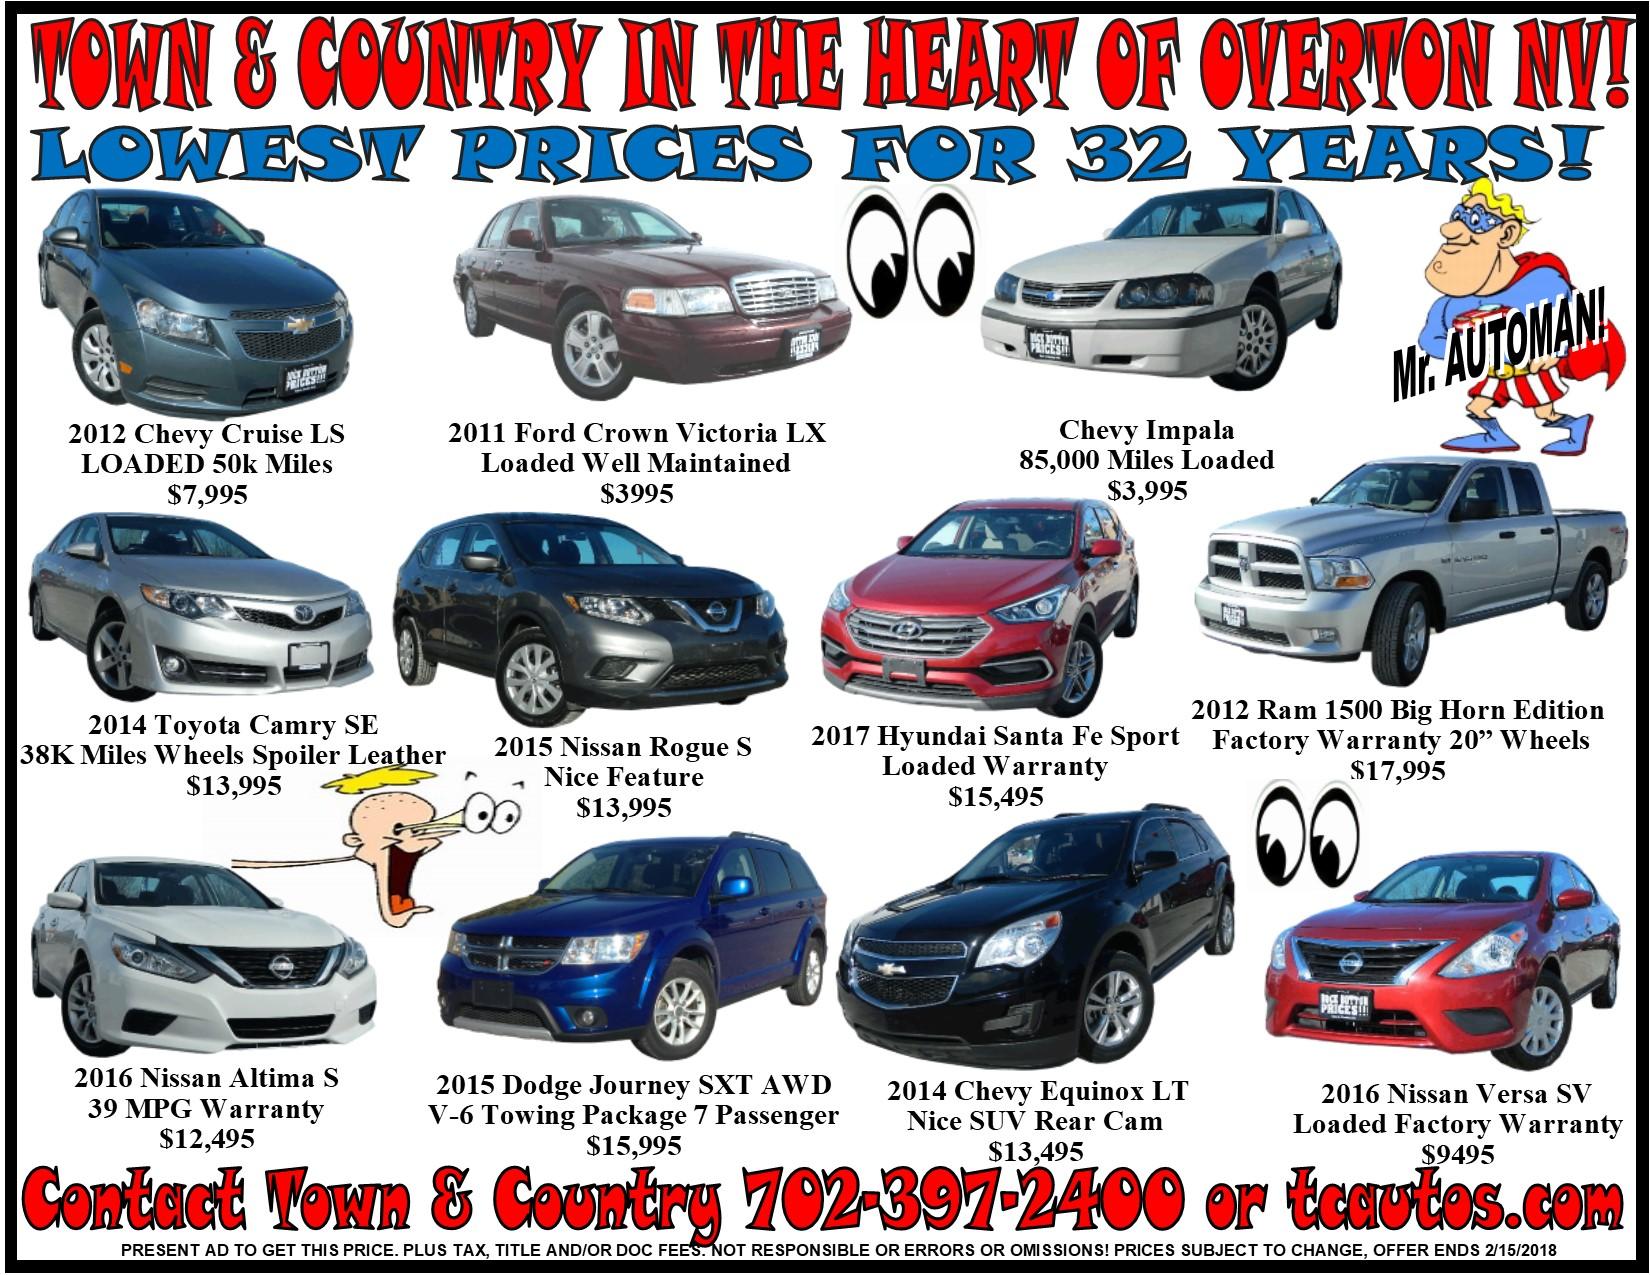 Pickup Trucks Car Warranties Specials Overton NV TOWN